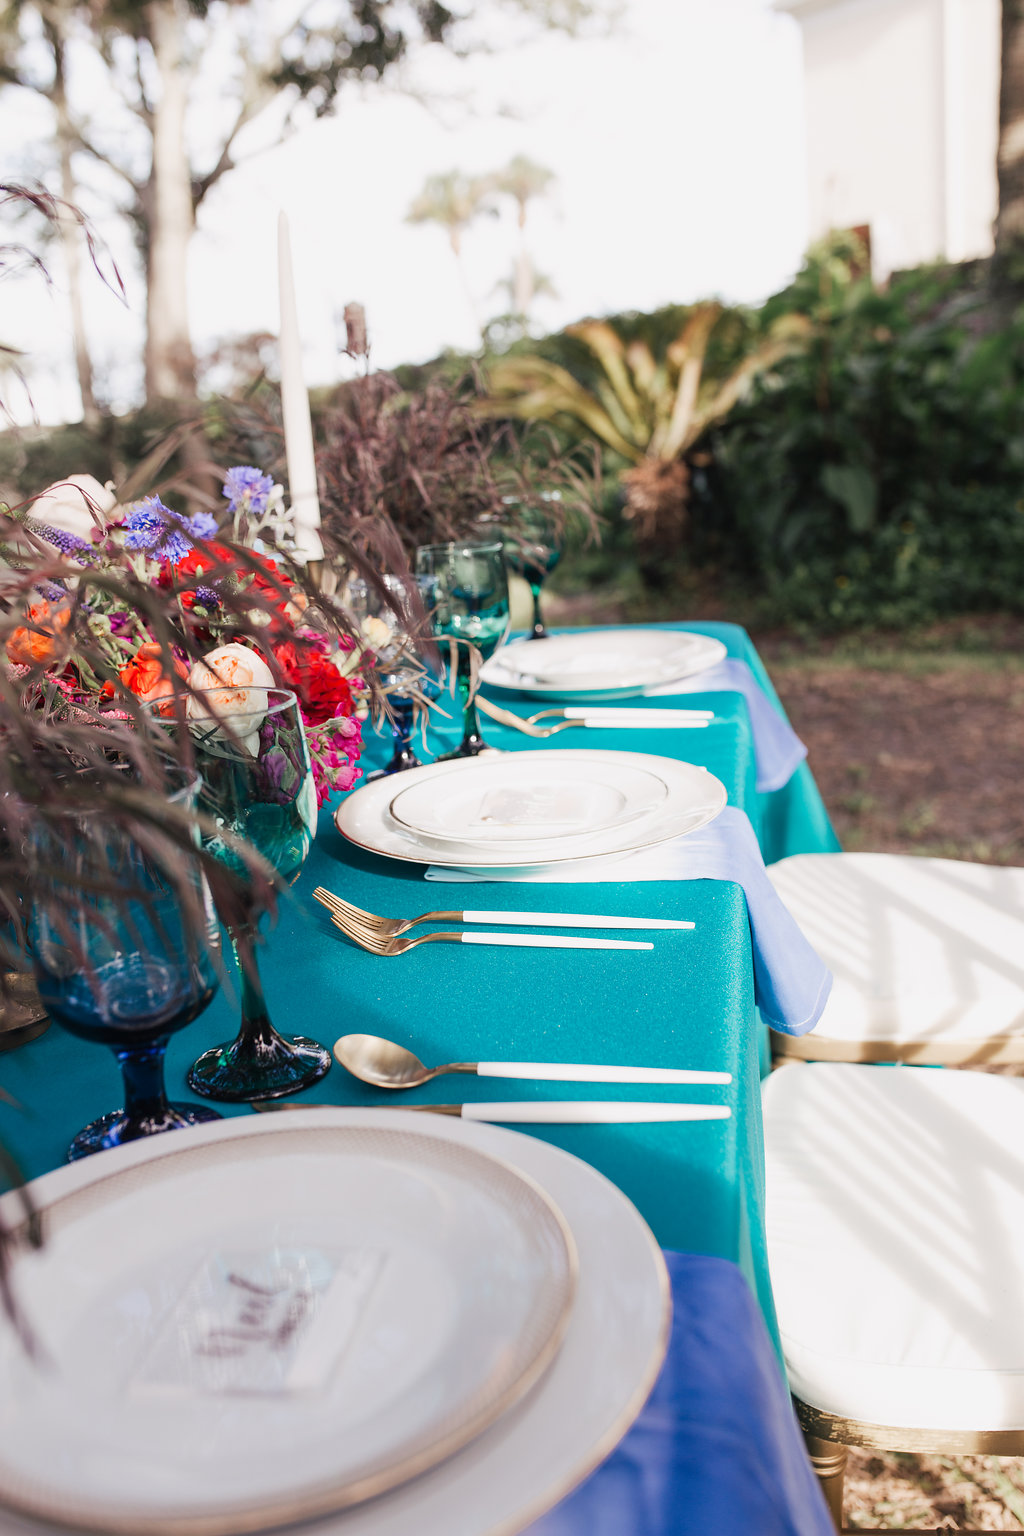 teal at weddings - photo by Alondra Vega Photography http://ruffledblog.com/jewel-toned-wedding-ideas-with-a-surprise-proposal